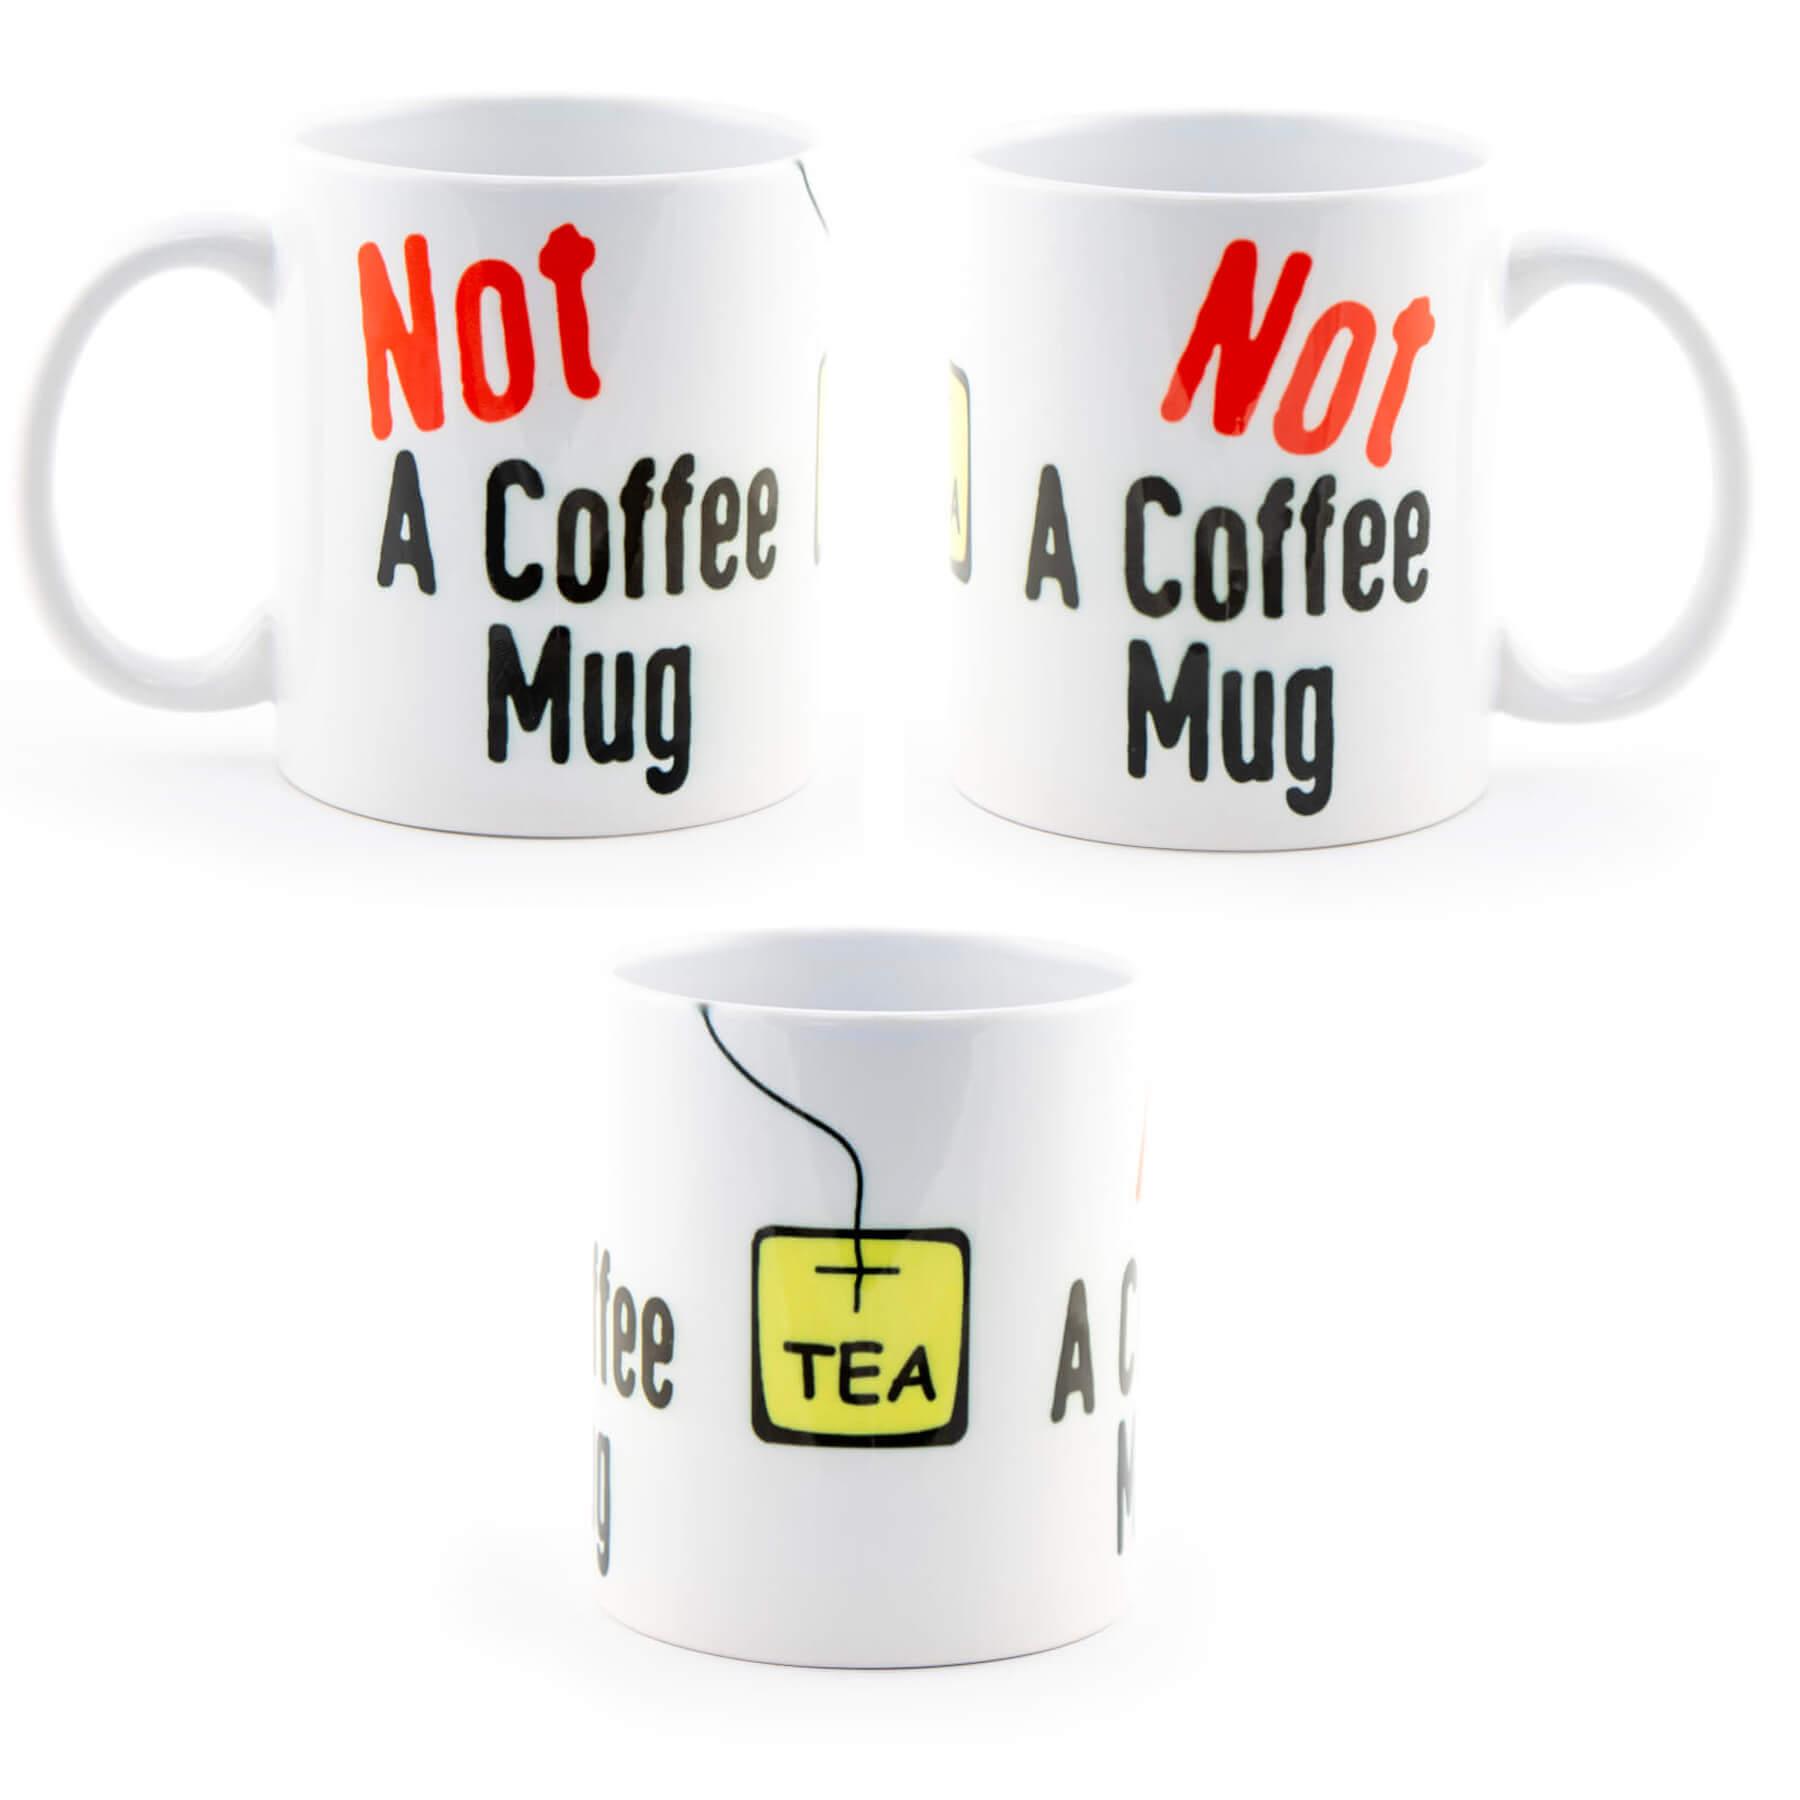 Not A Coffee Mug